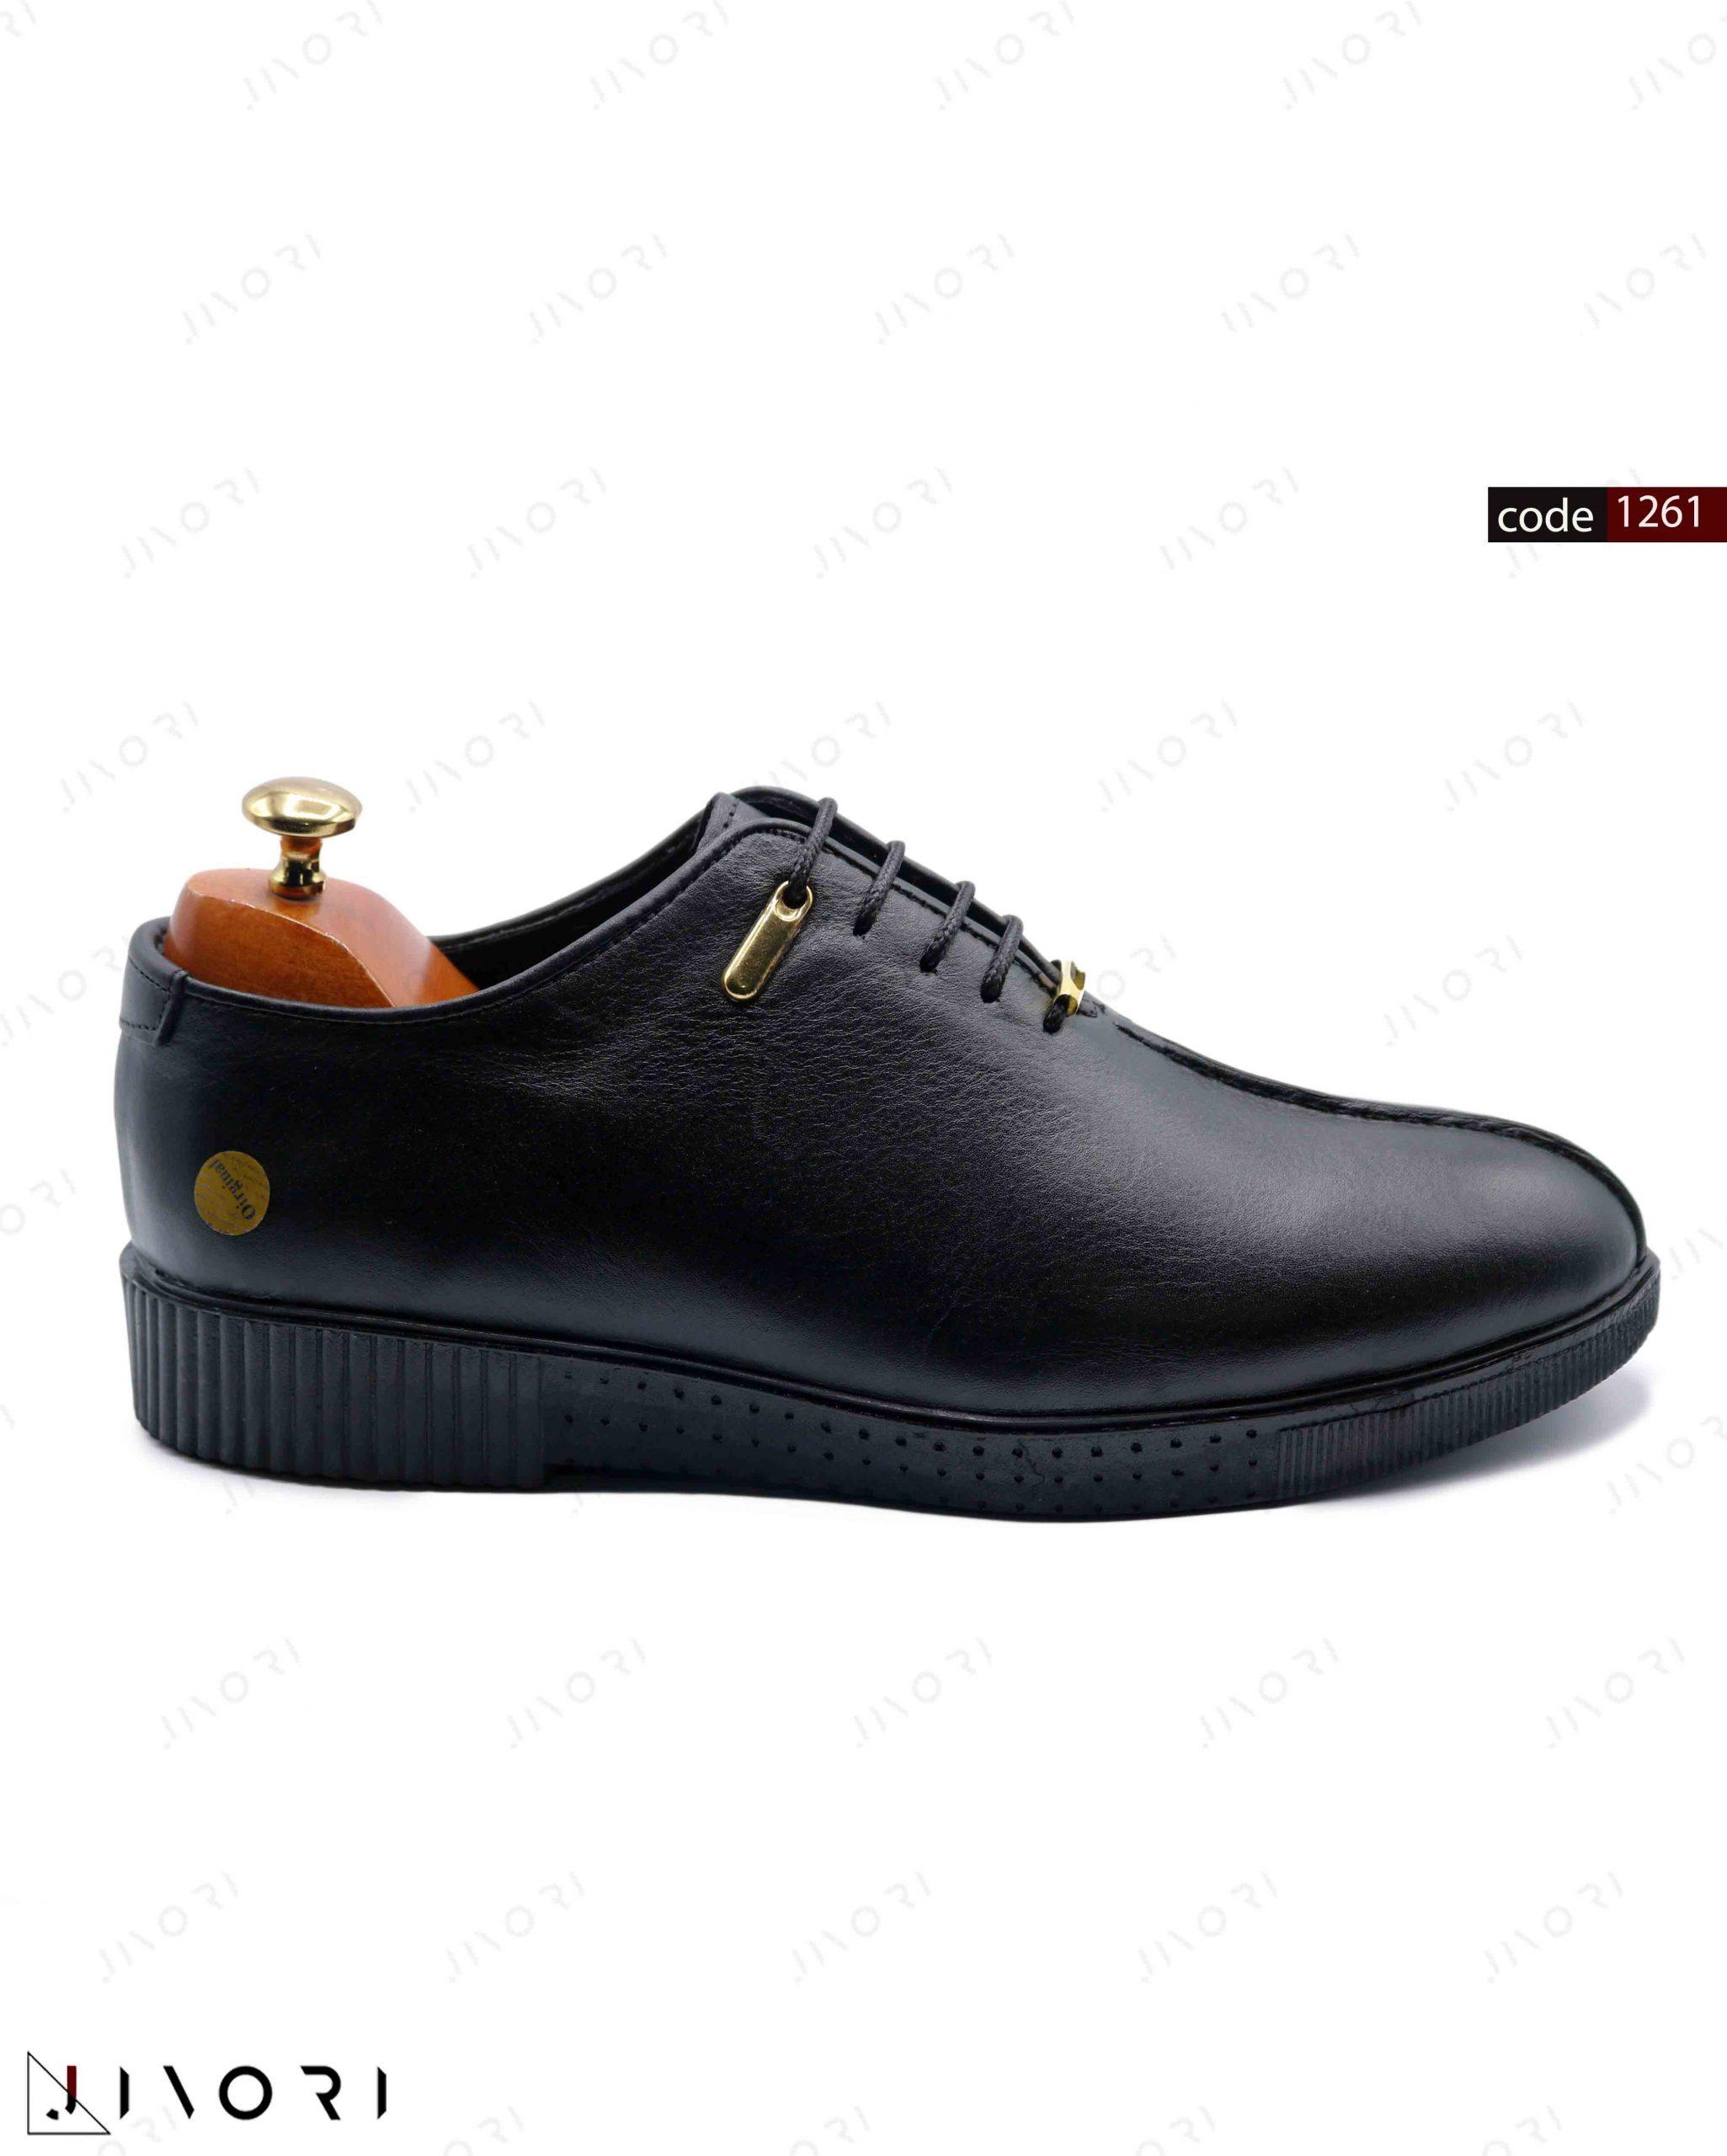 کفش تمام چرم اکو (1261)